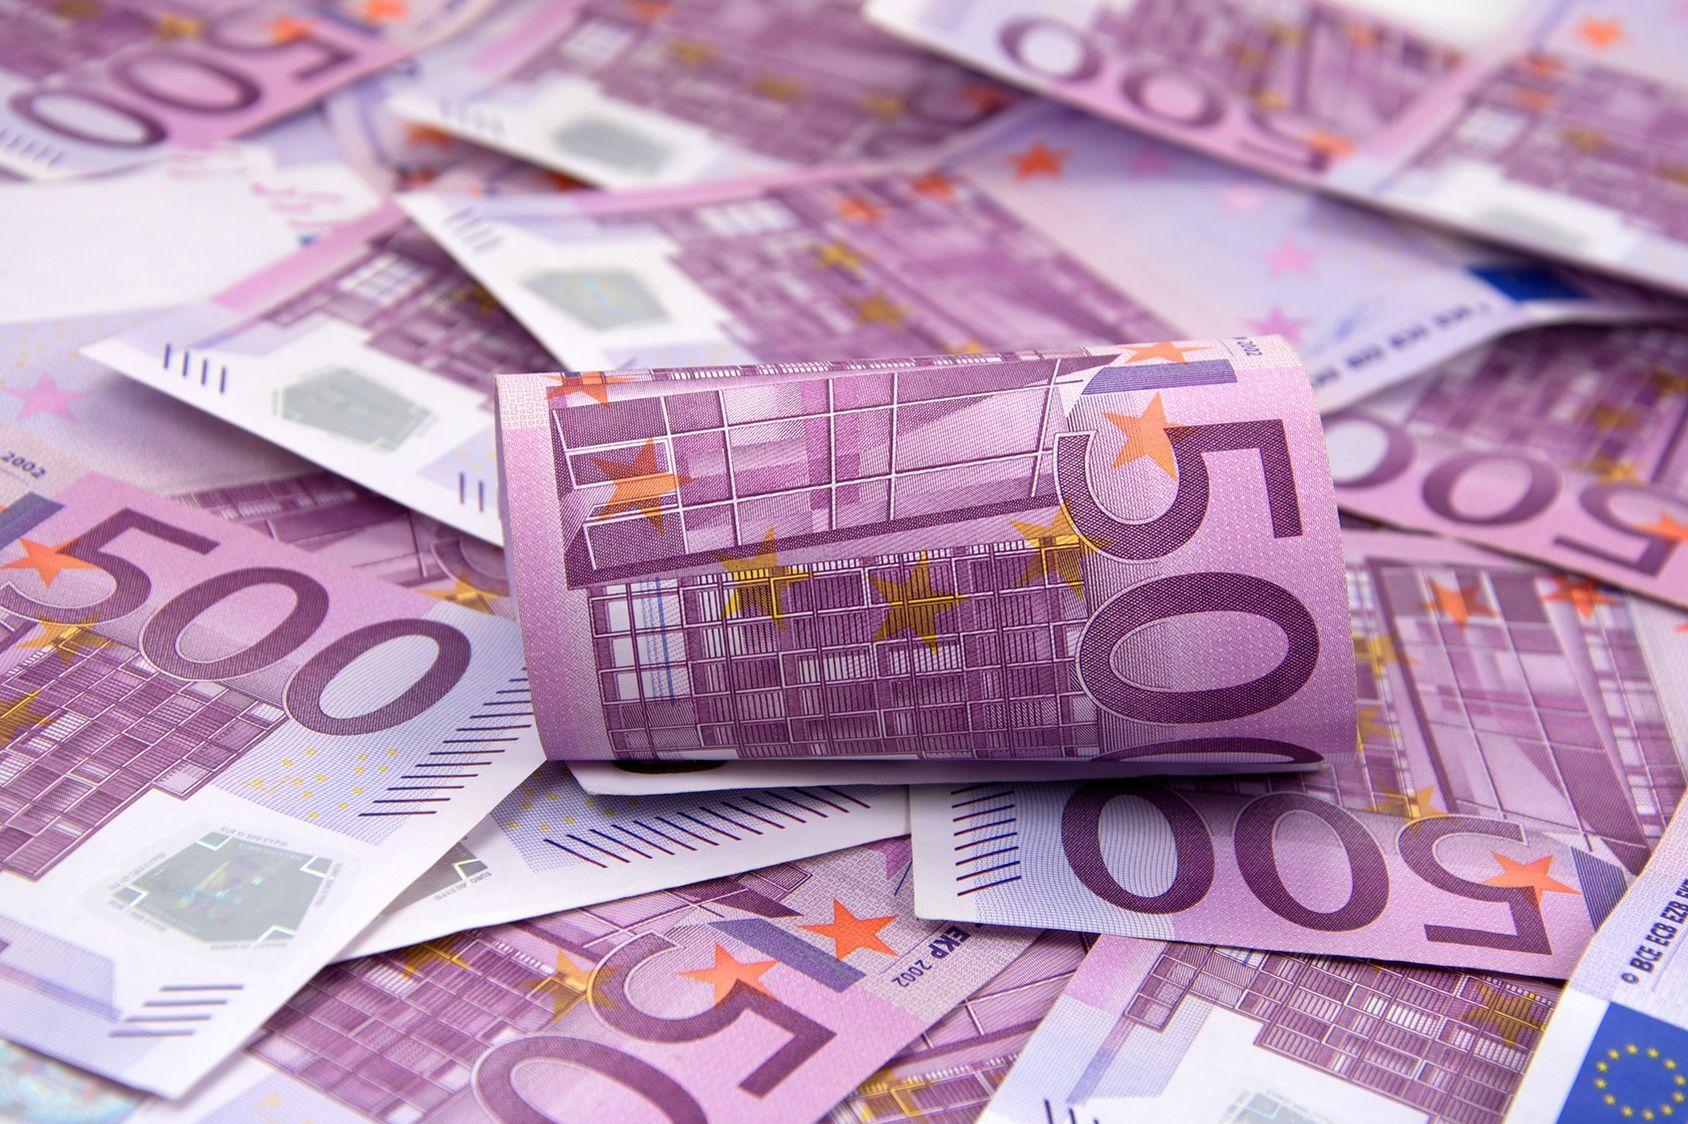 la bce va cesser d 39 imprimer les billets de 500 euros fin 2018. Black Bedroom Furniture Sets. Home Design Ideas